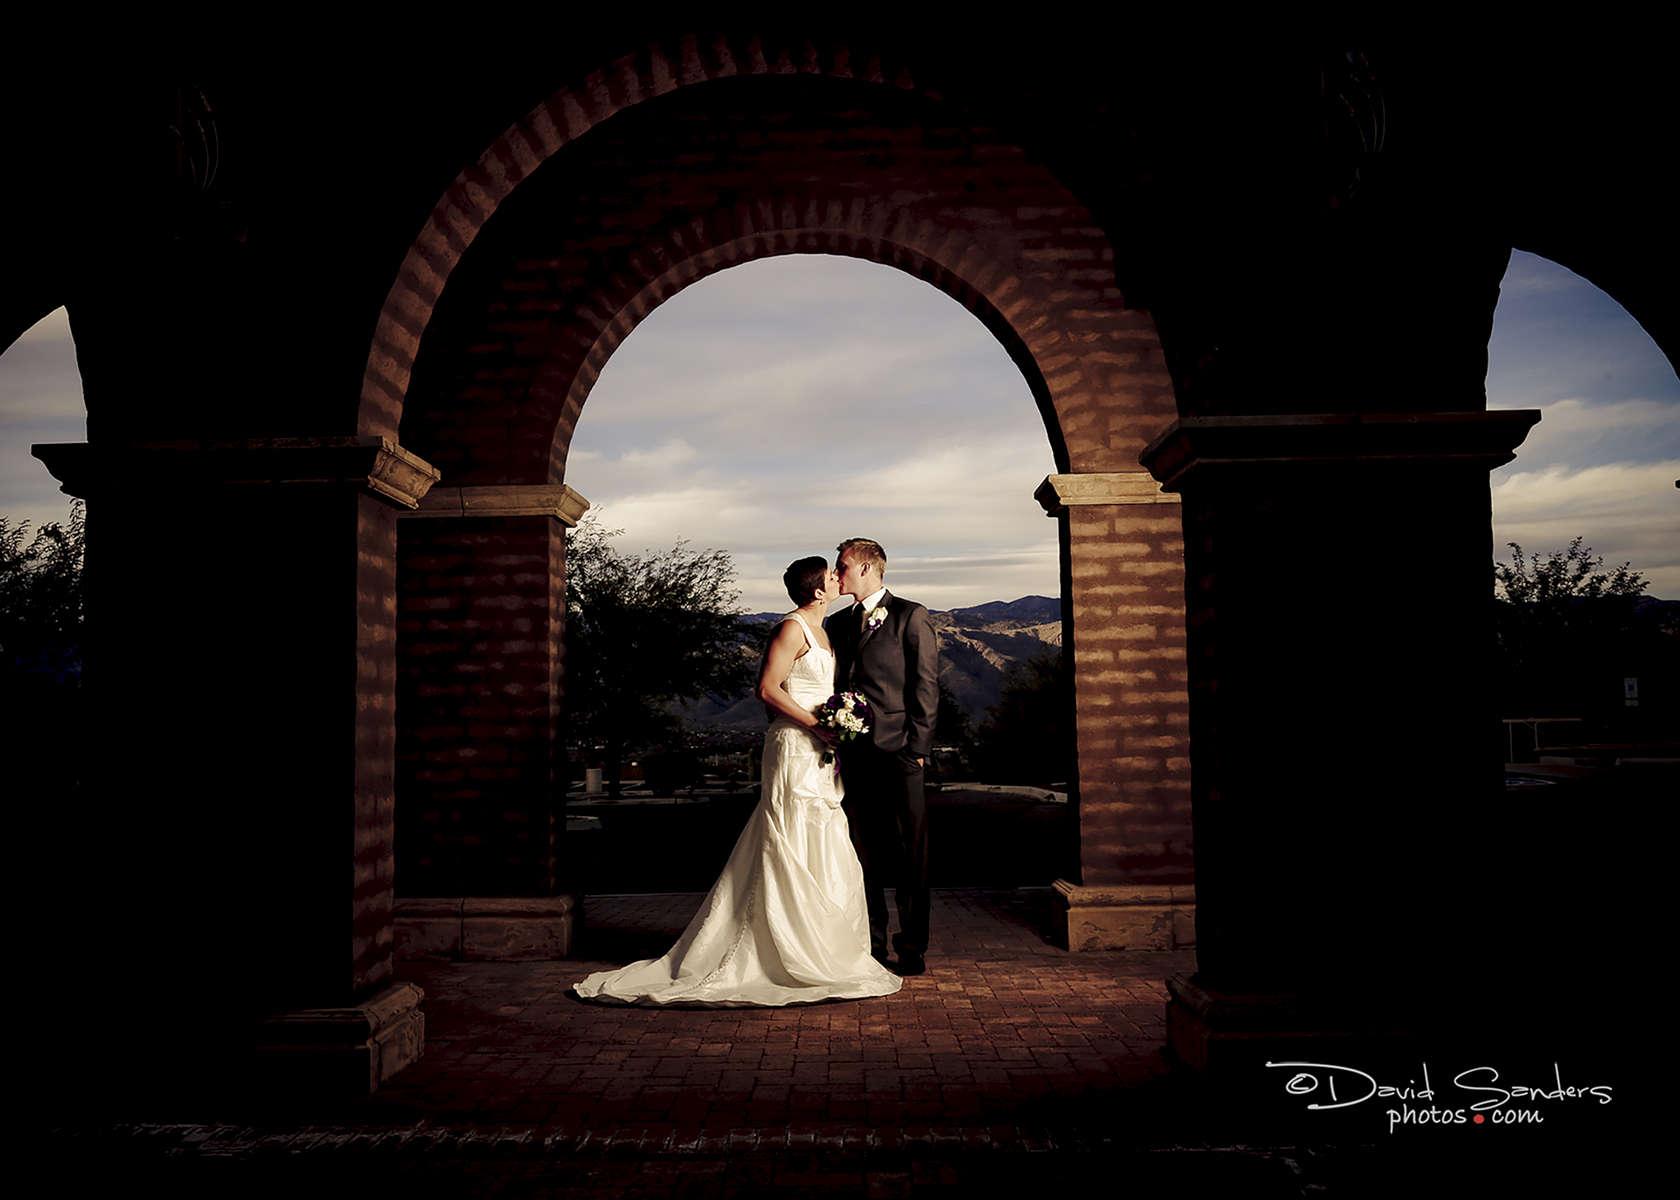 ©davidsandersphotos.com520.419.6850